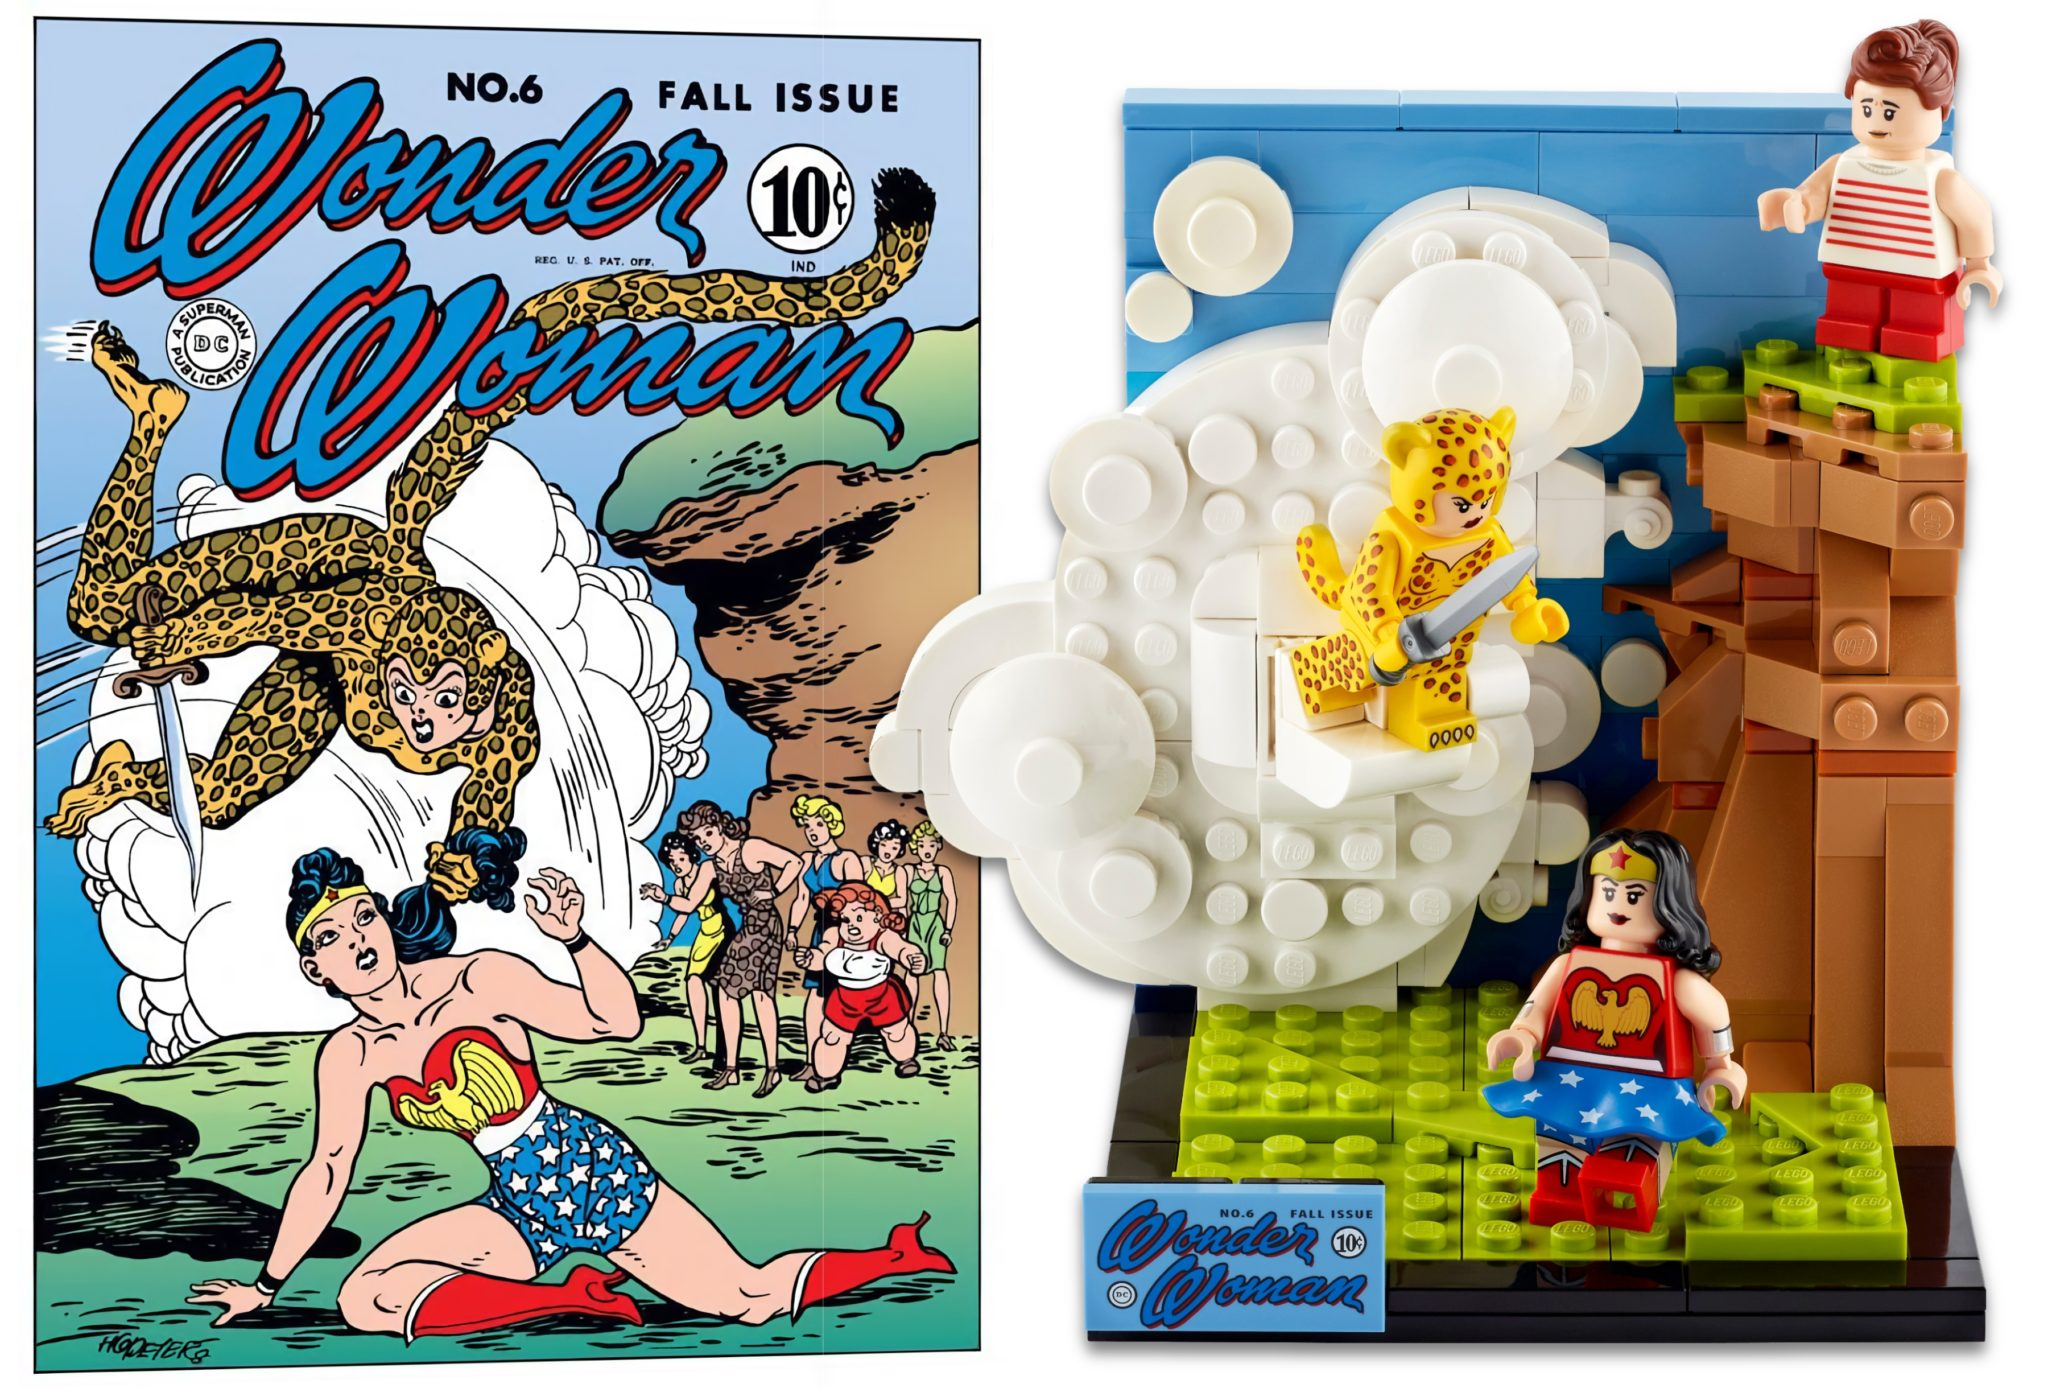 LEGO Dc 77906 Wonder Woman No6